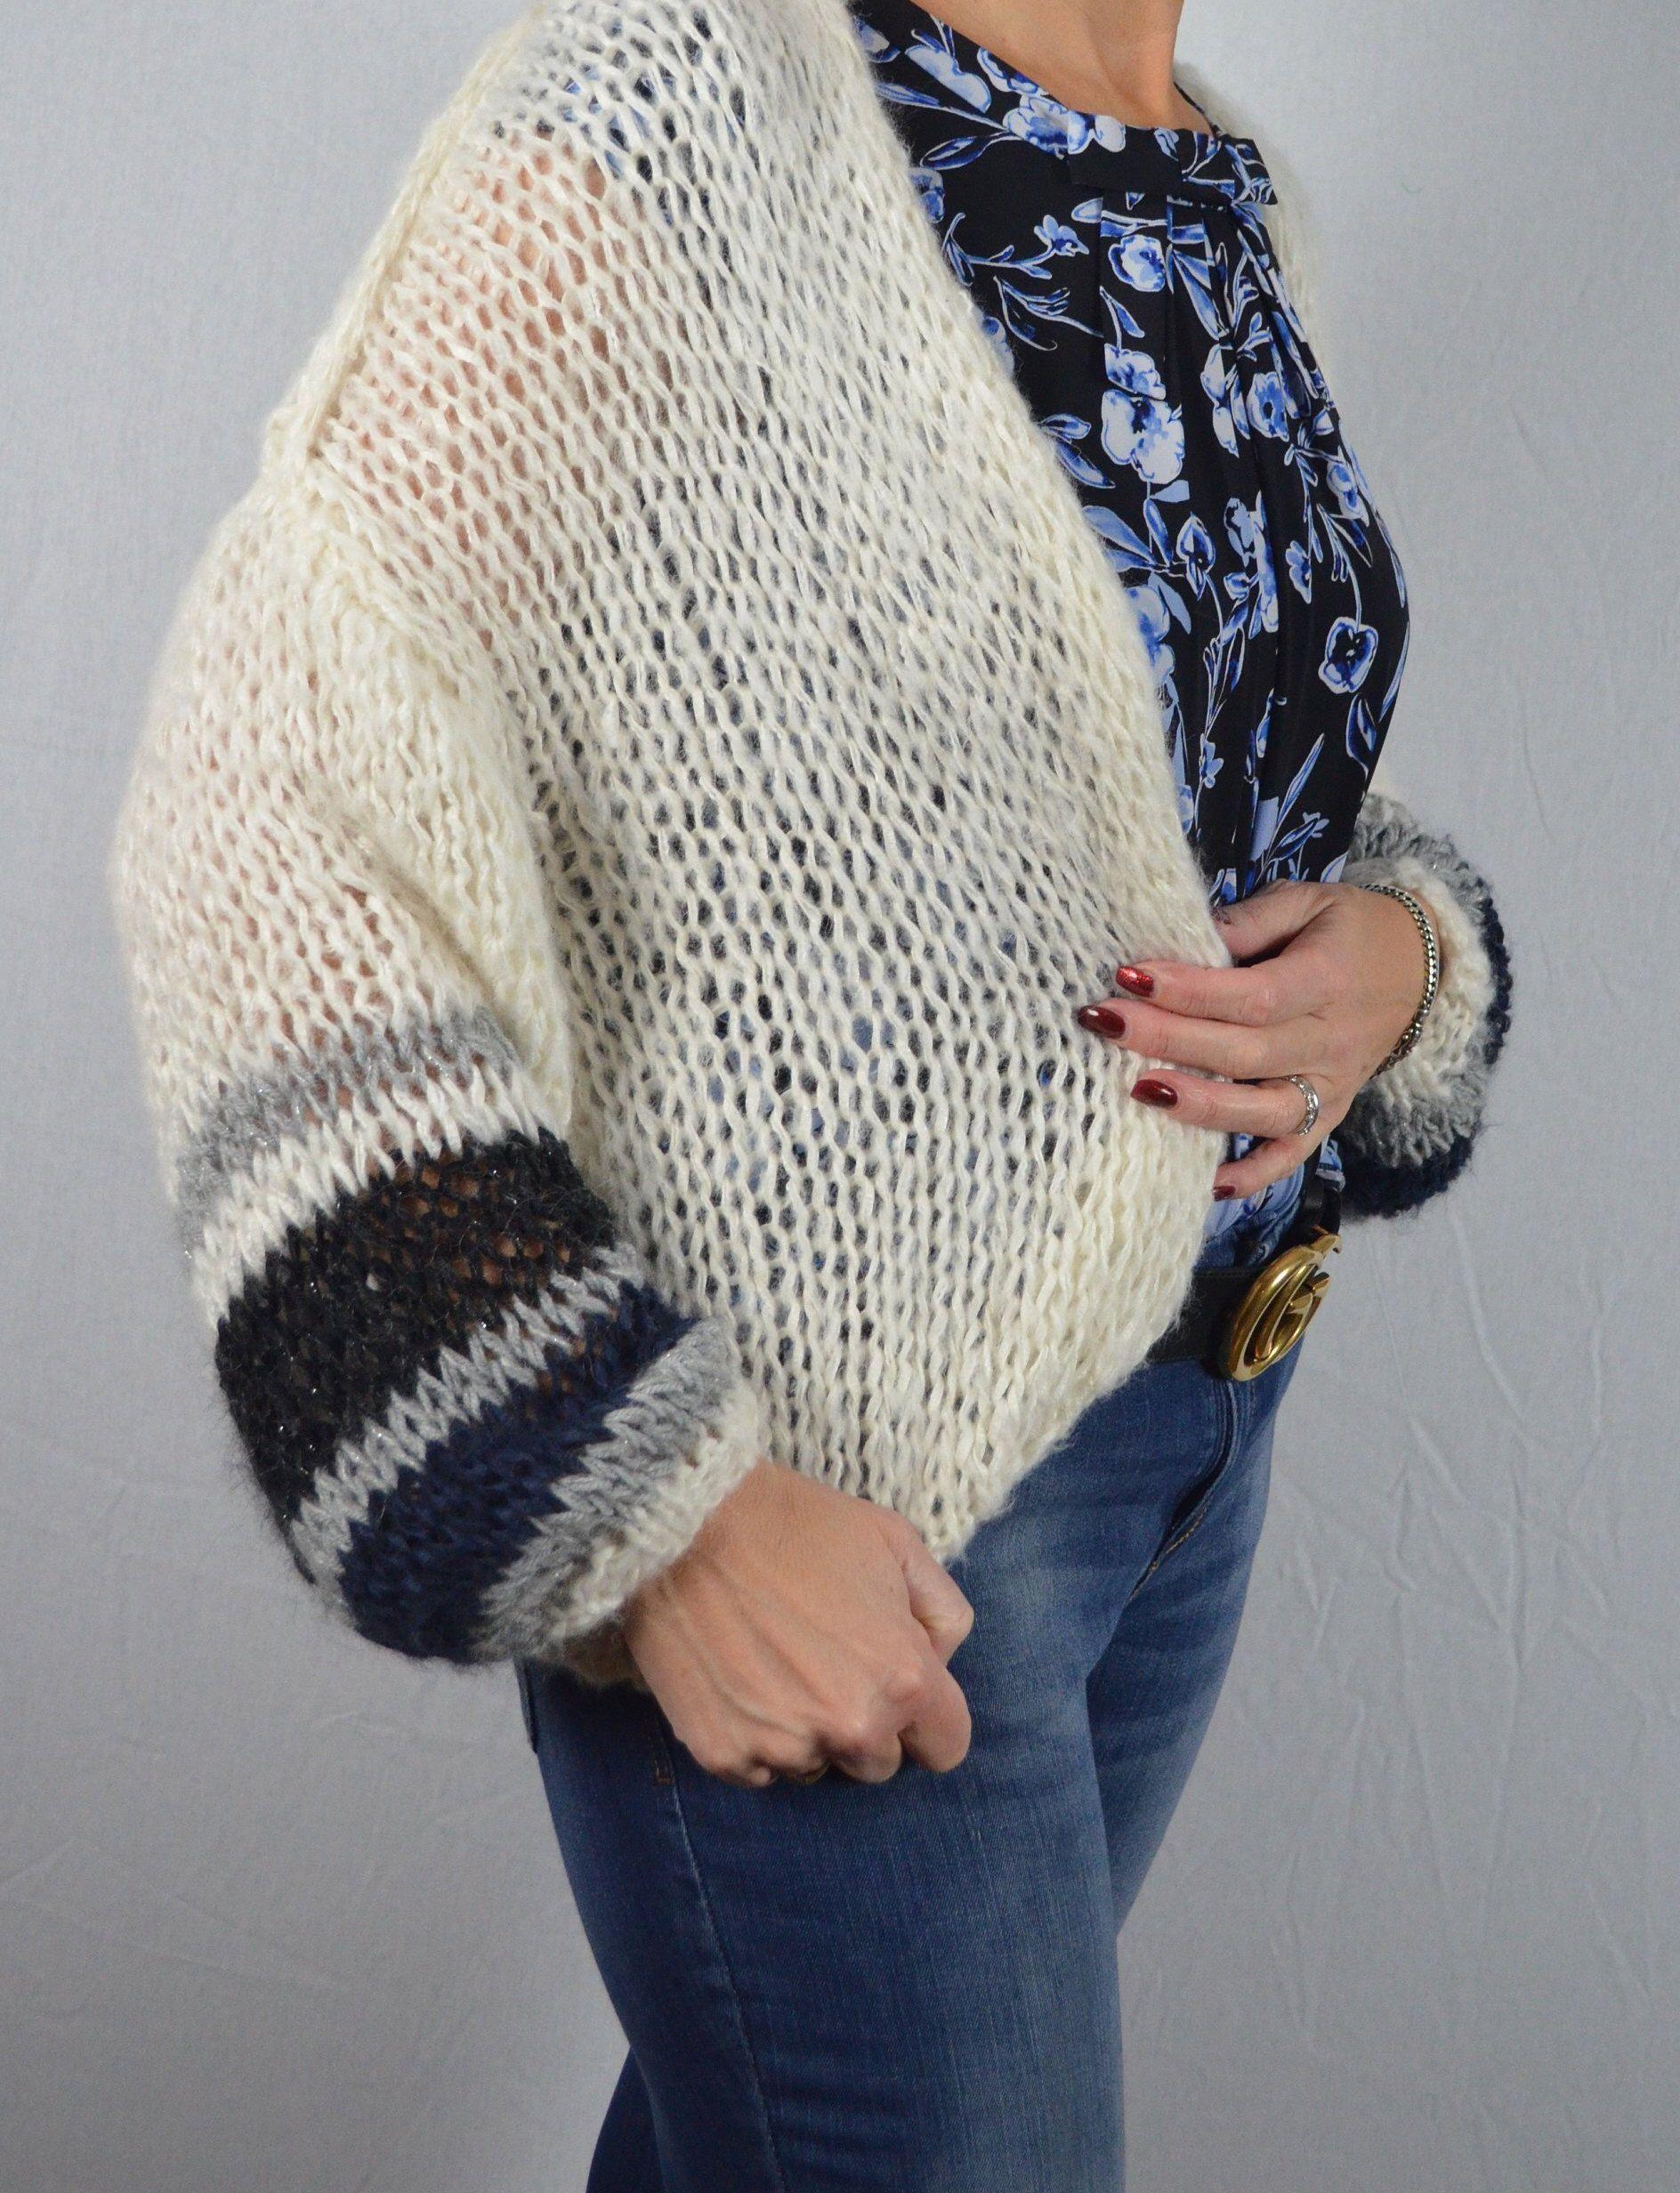 Wit Blauw Gestreepte Trui.Cardigan Wit Blauw Knitware Designlabel Blue 72